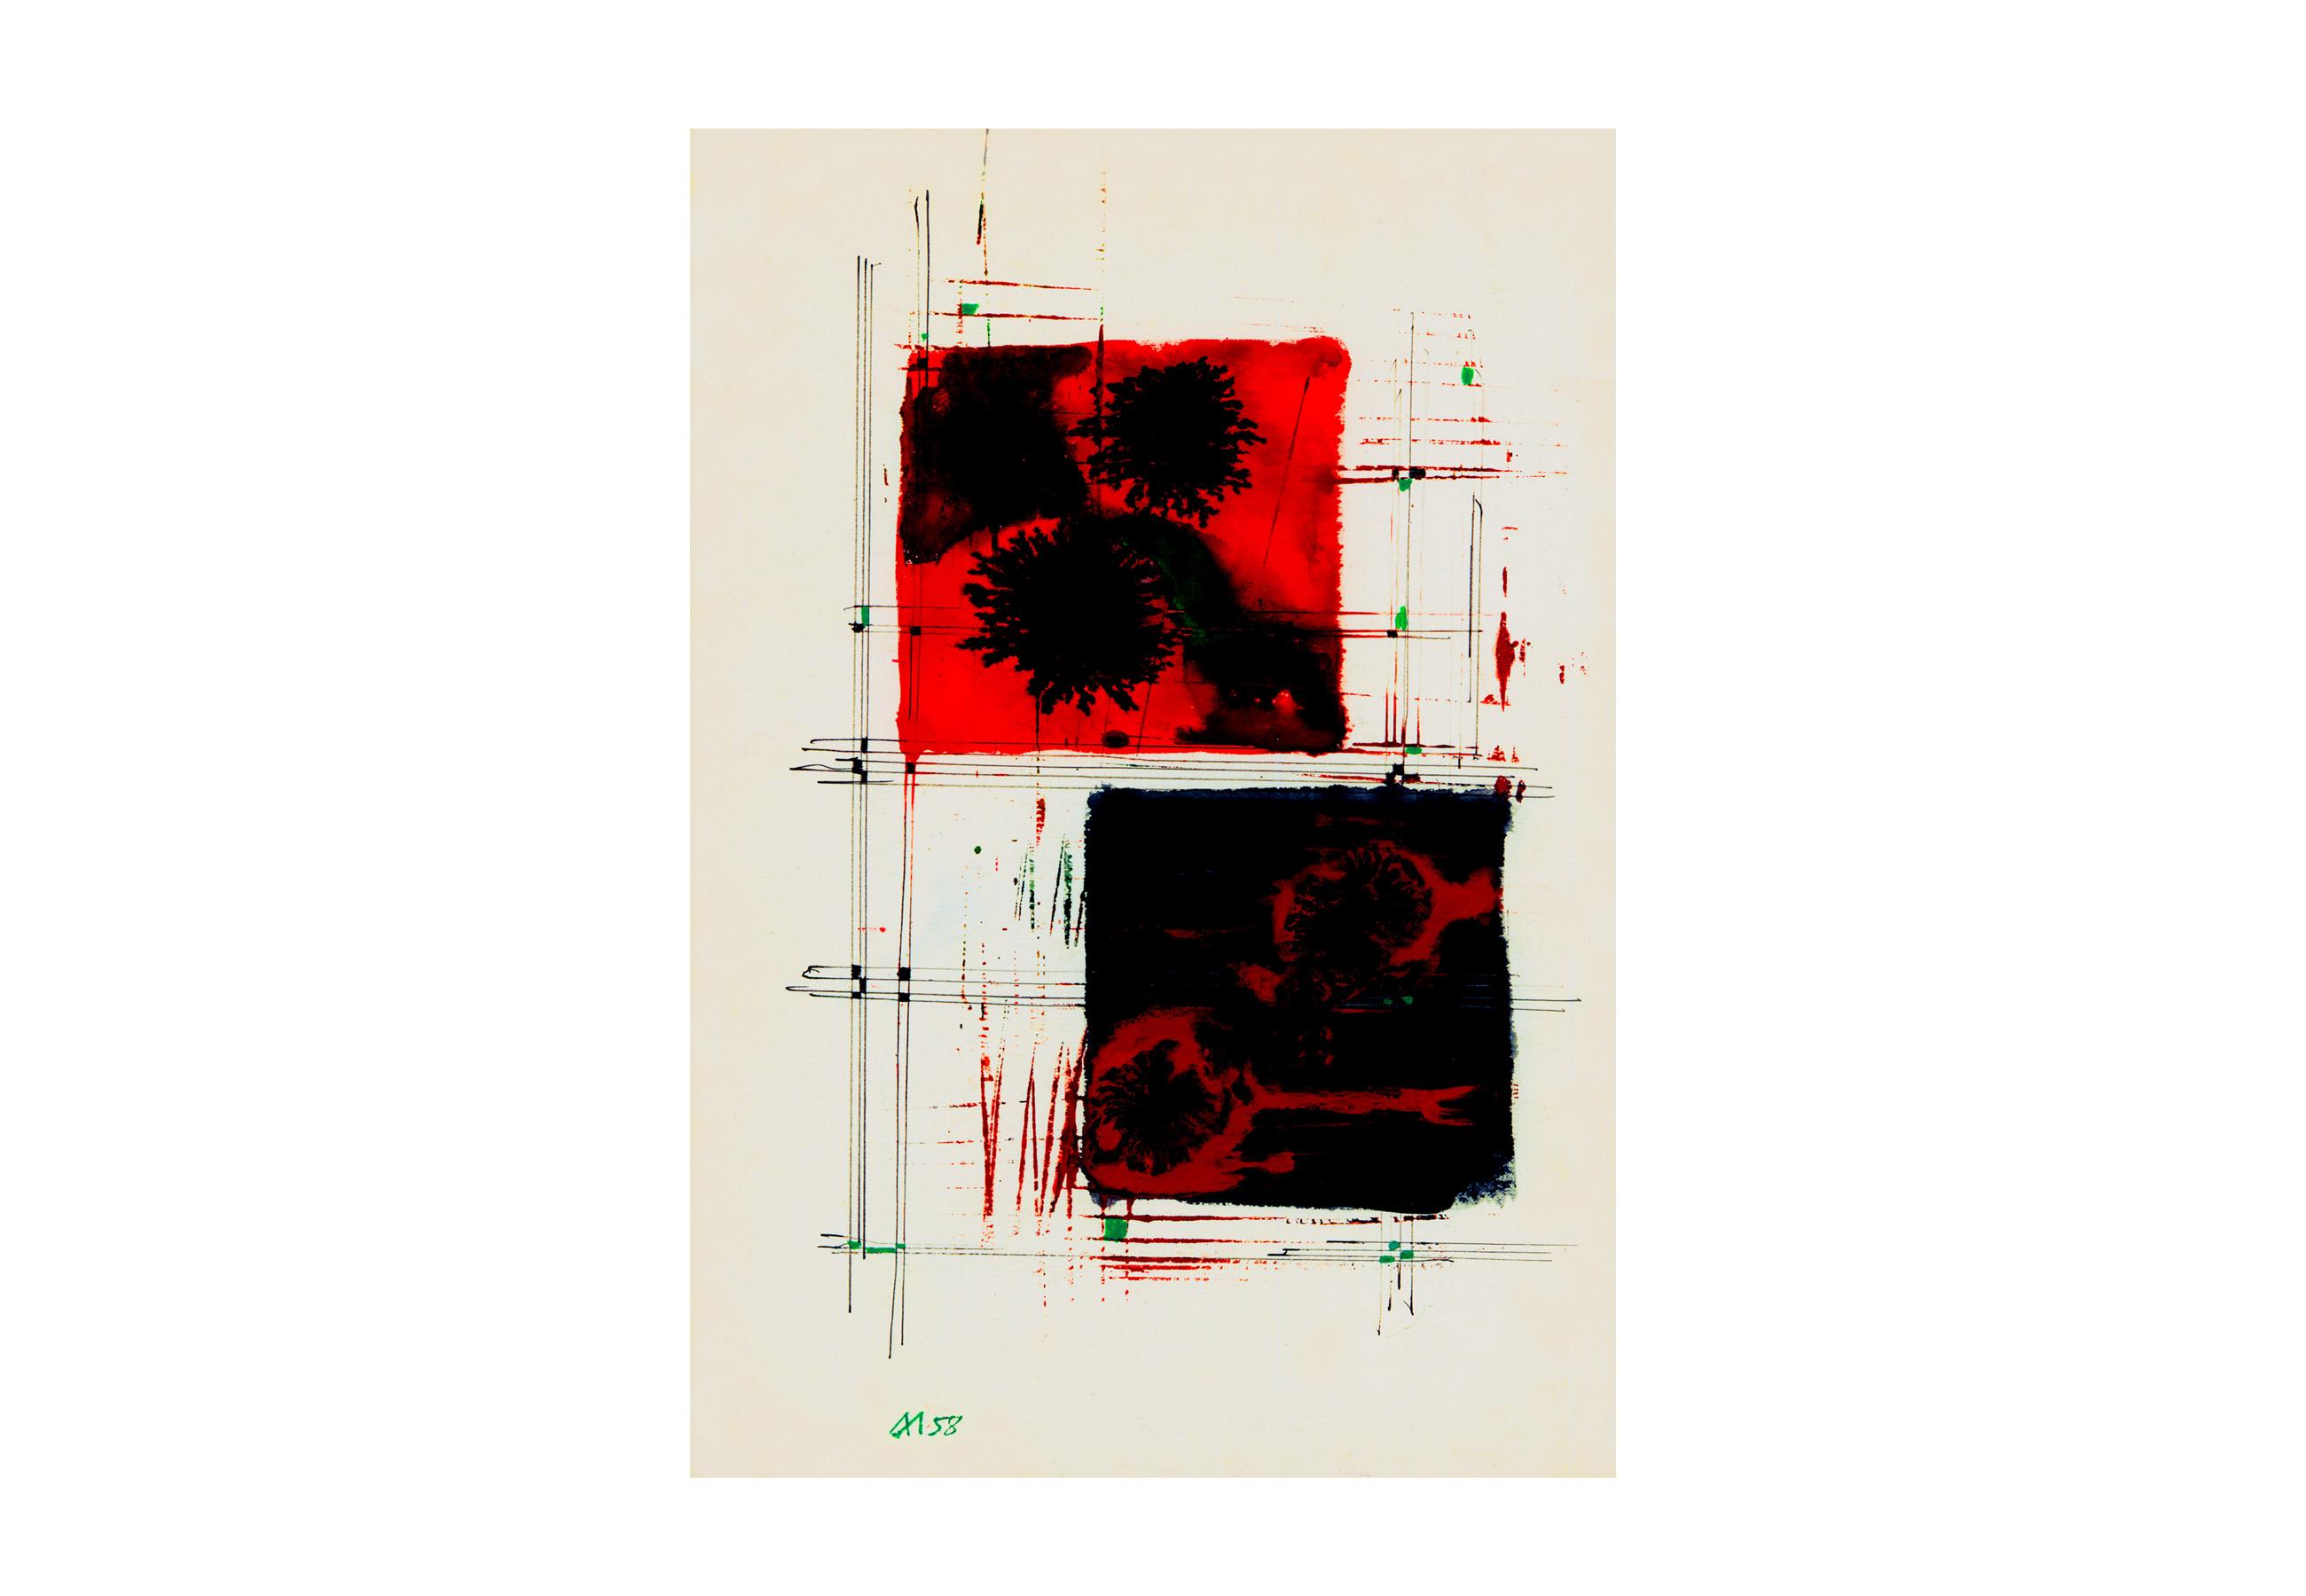 Lamm-Portfolio-1956-59-21.jpg